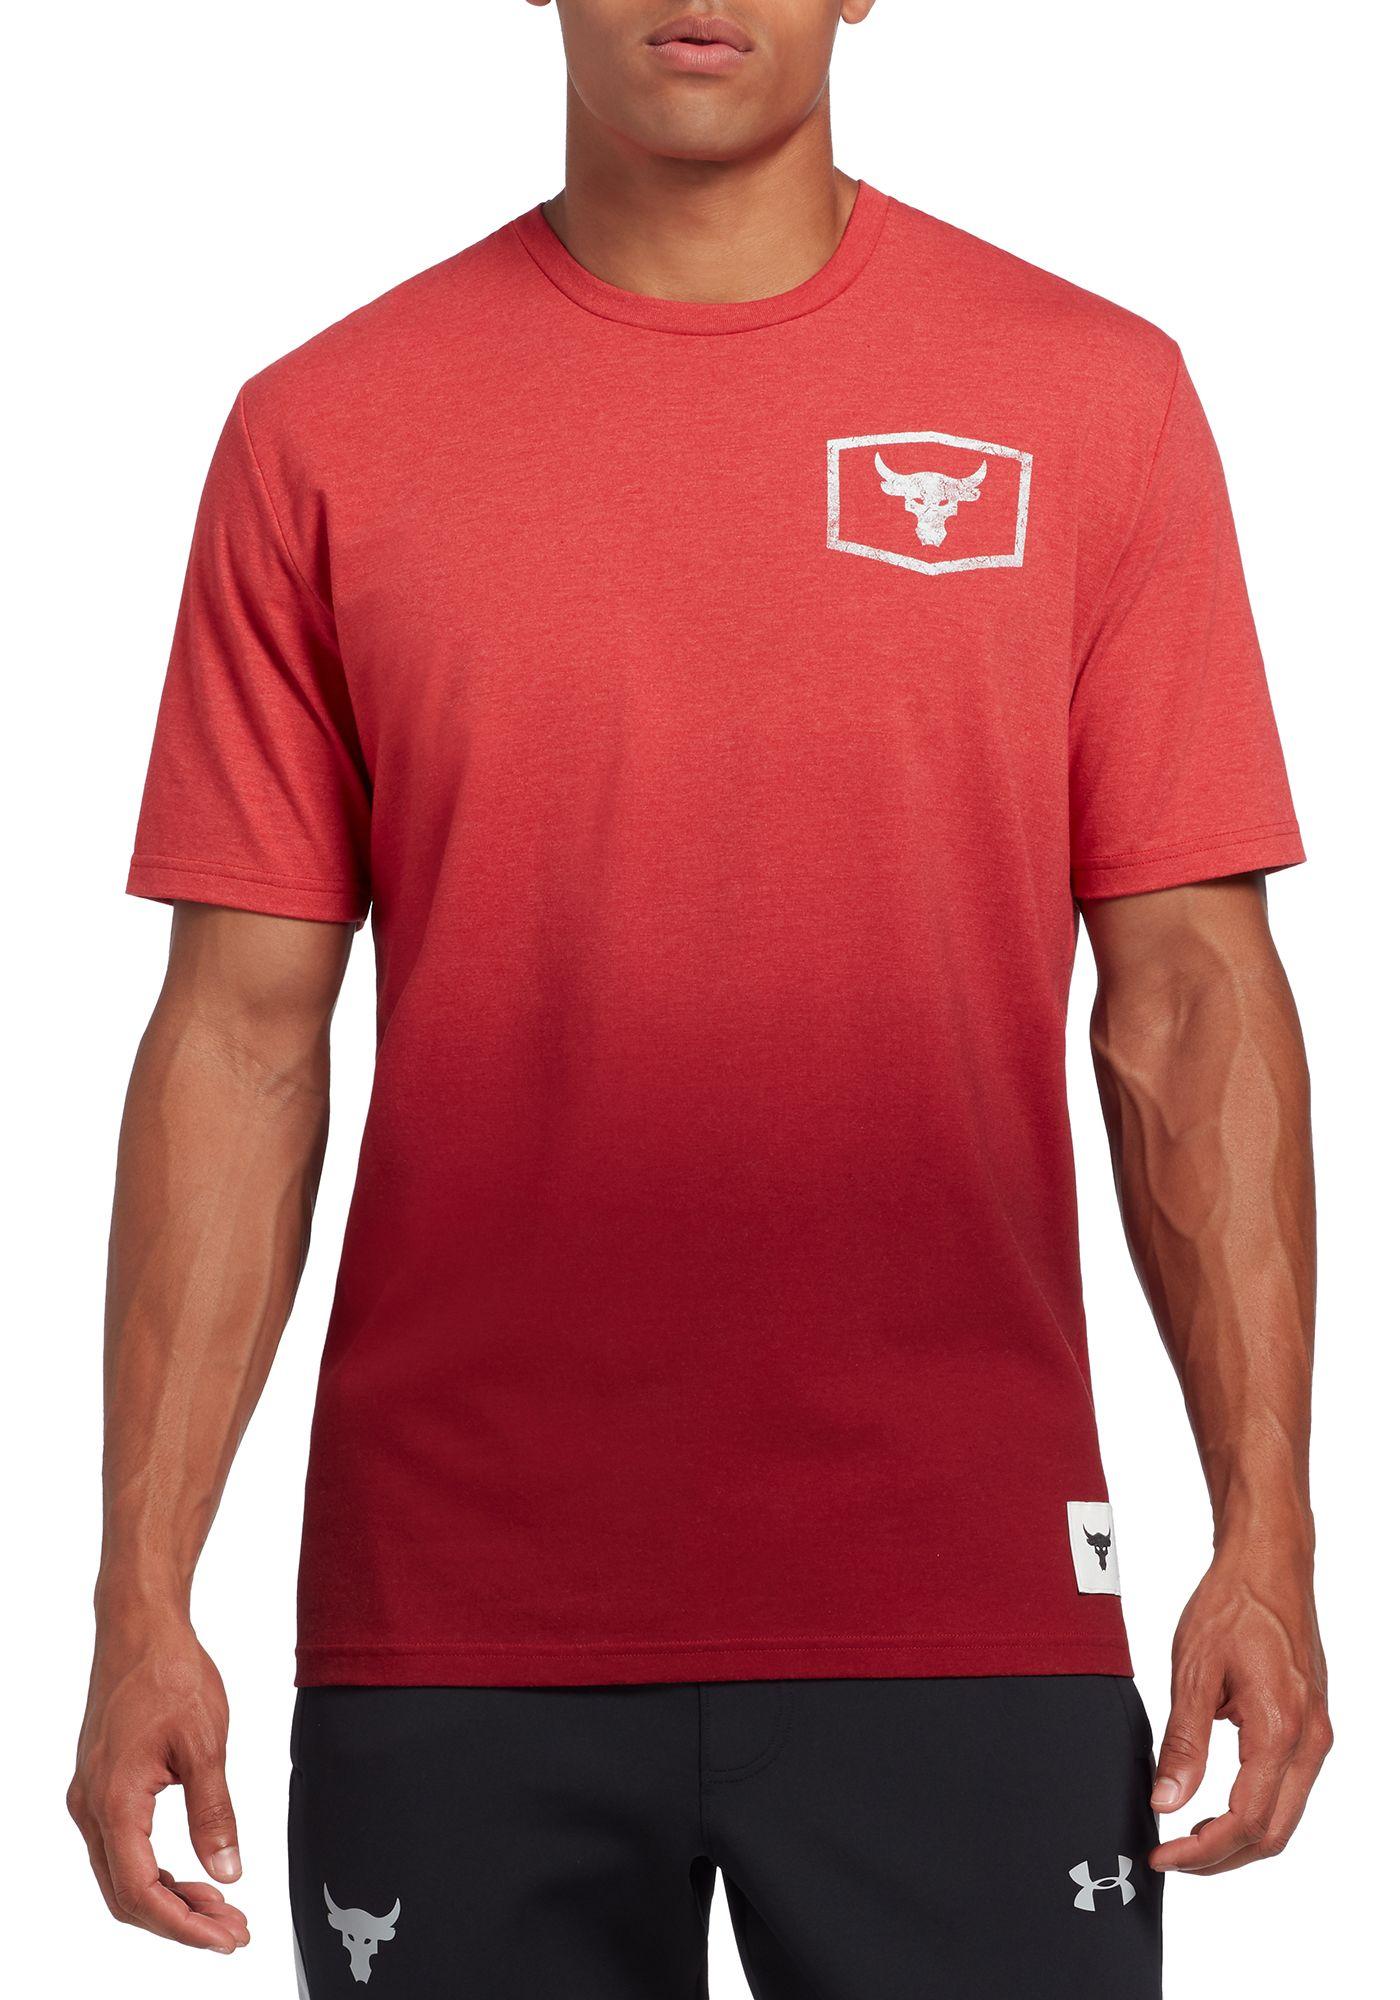 Under Armour Men's Project Rock Iron Paradise Graphic T-Shirt